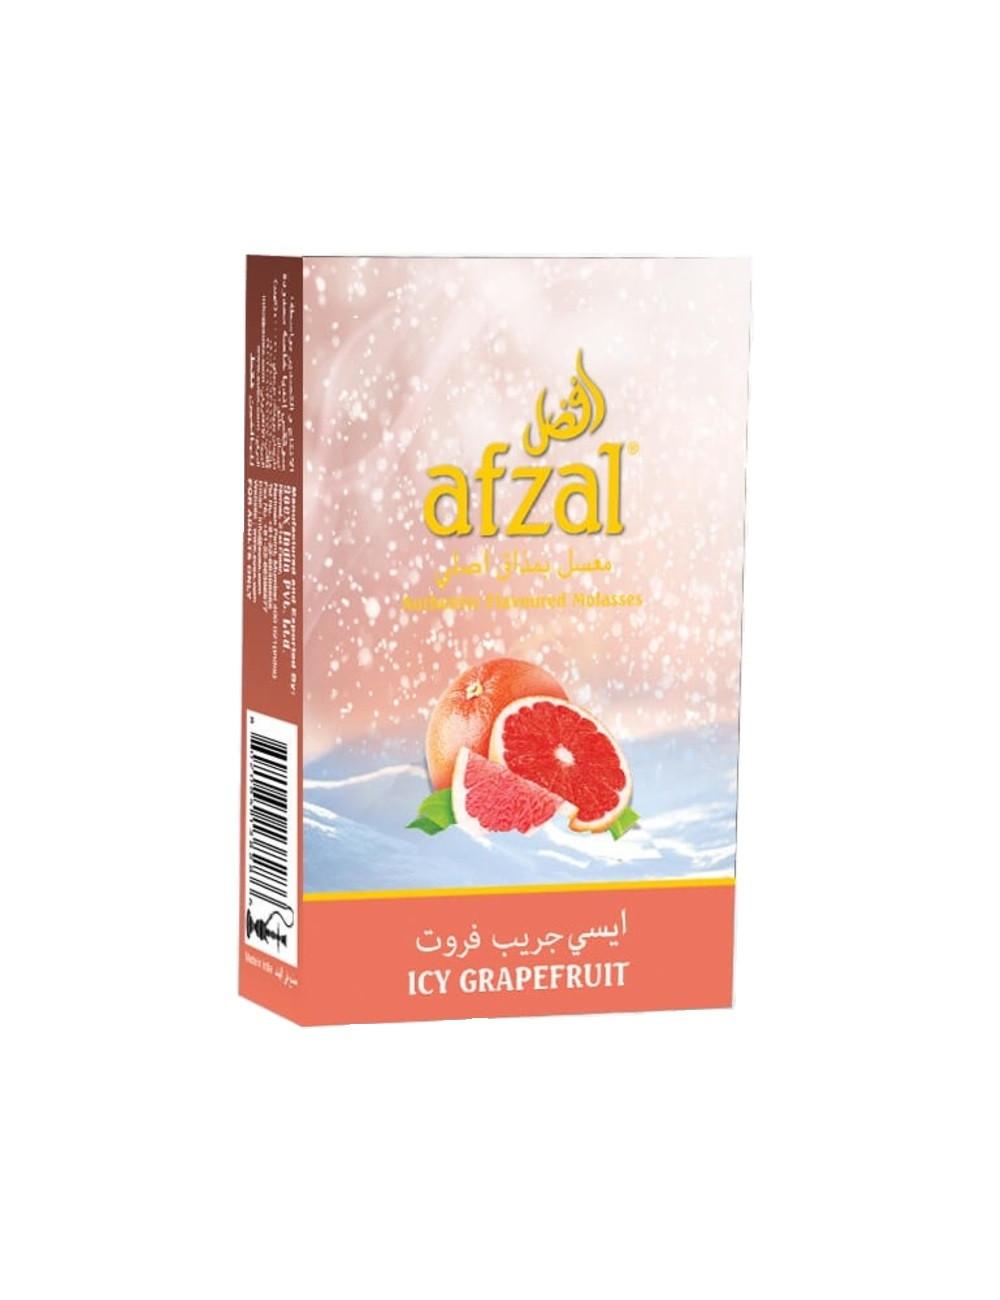 Icy grapefruit